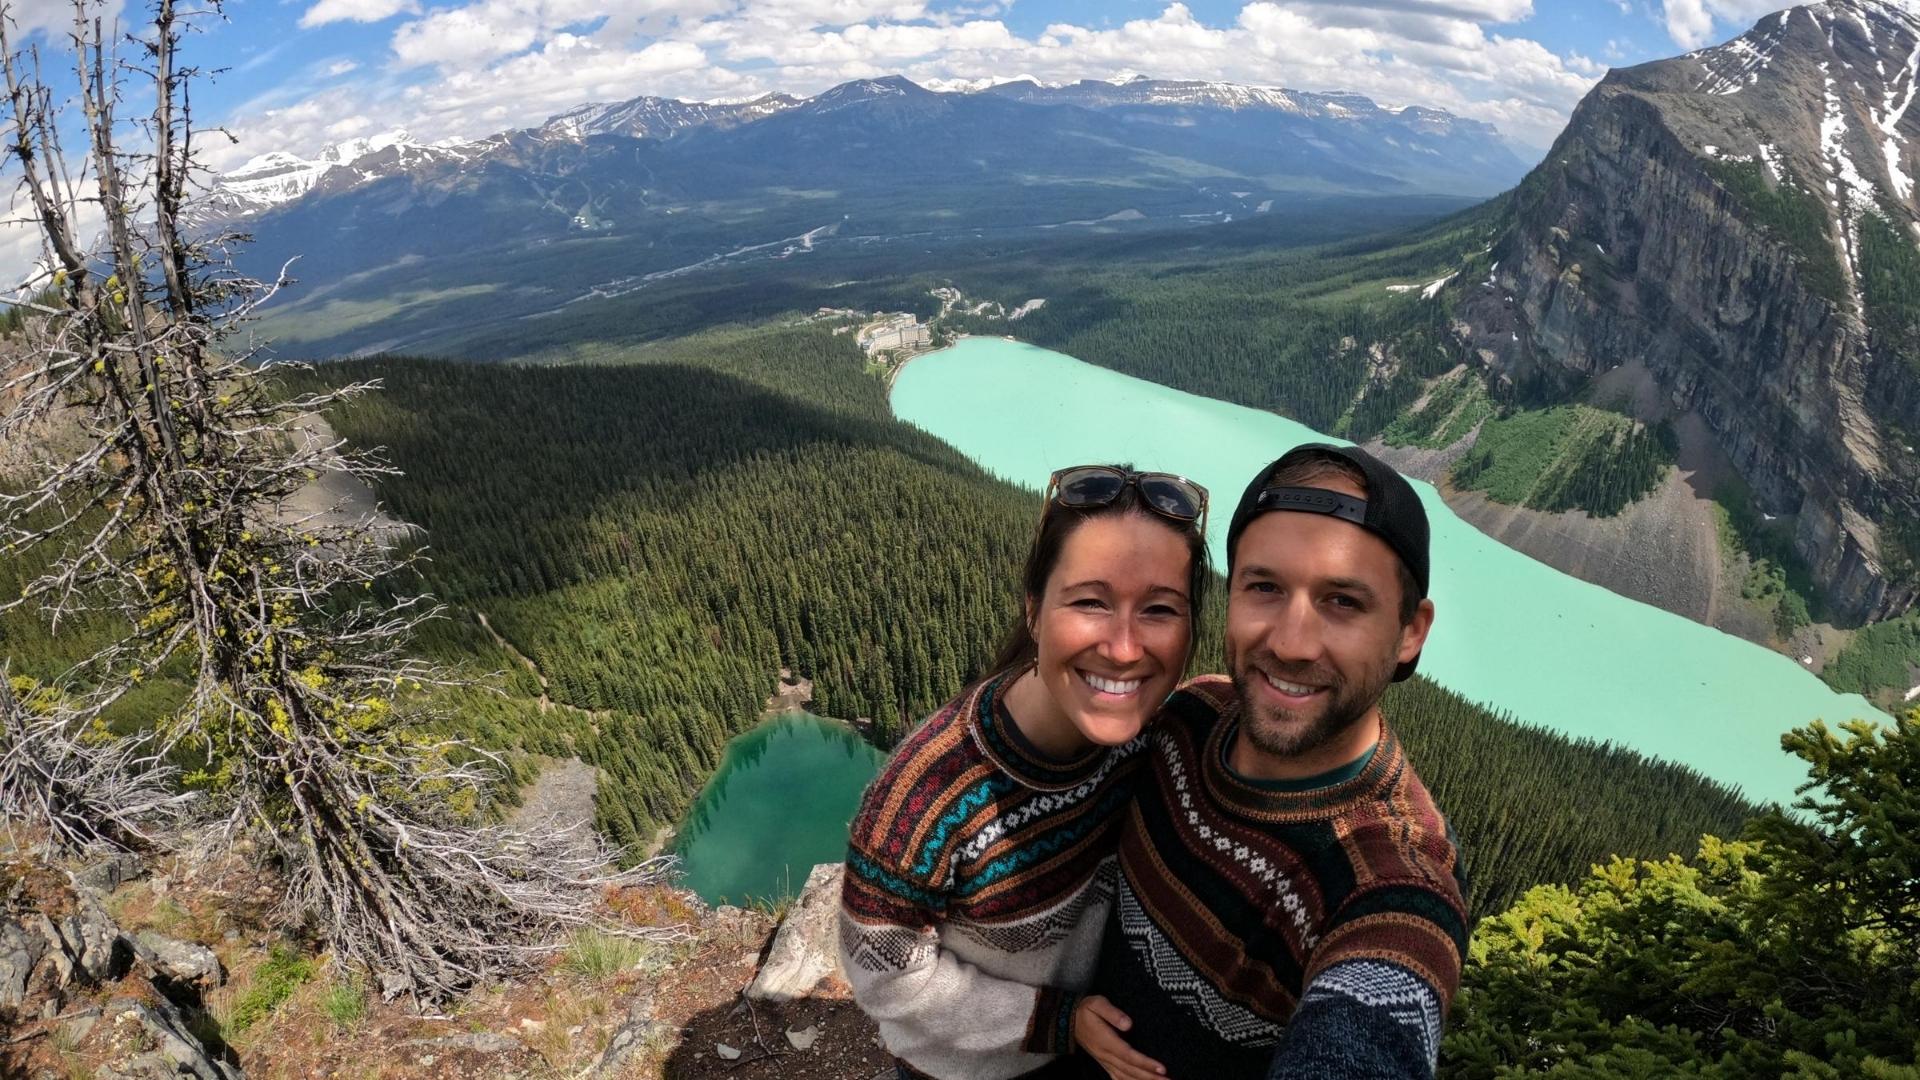 Partner Spotlight: Zac & Ine from World Wild Hearts